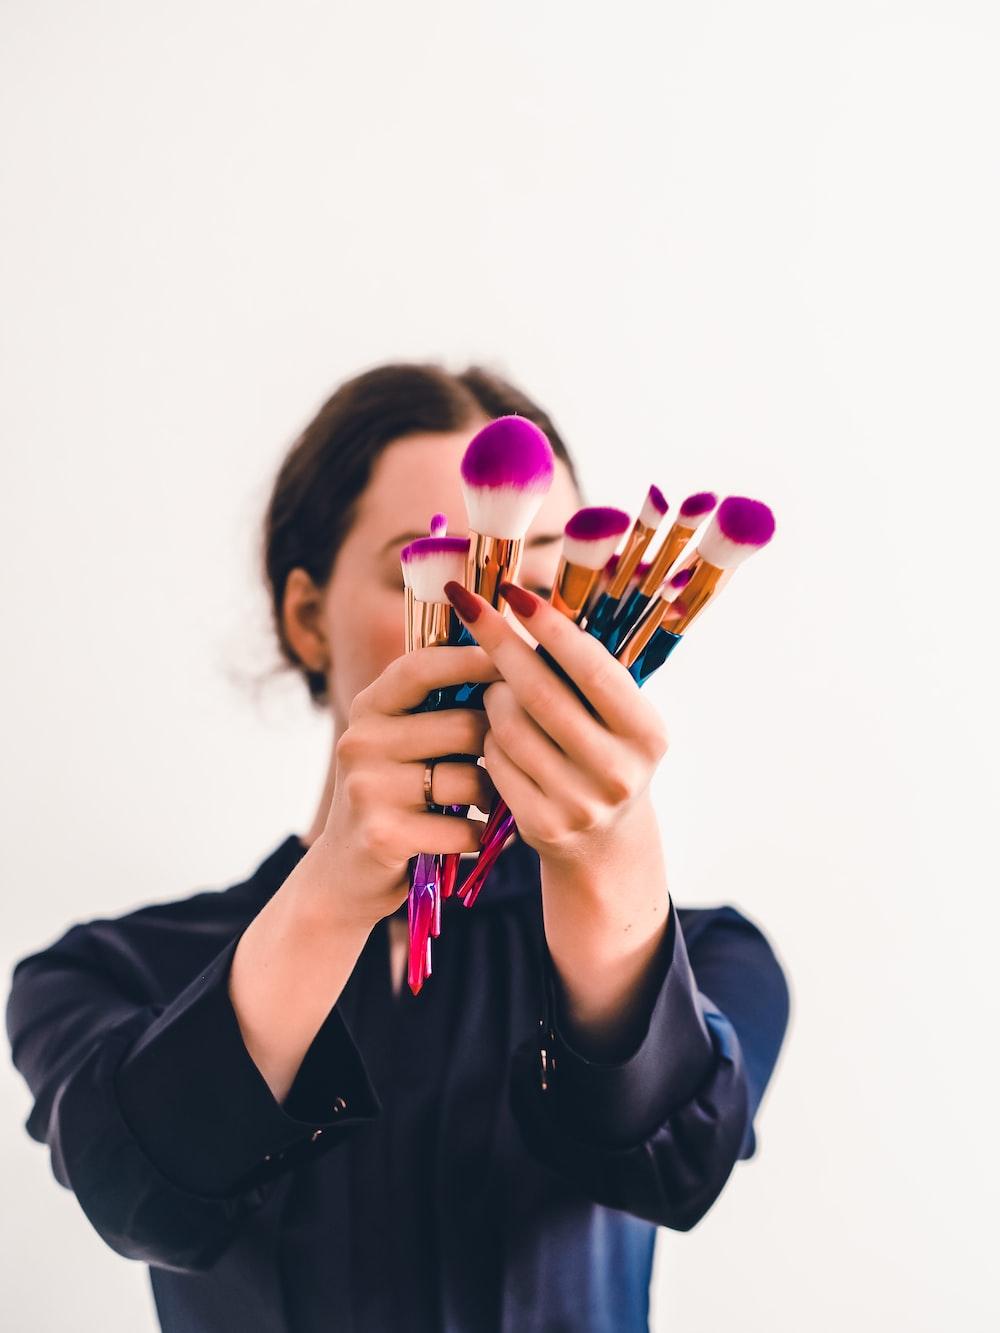 woman in black jacket holding makeup brush